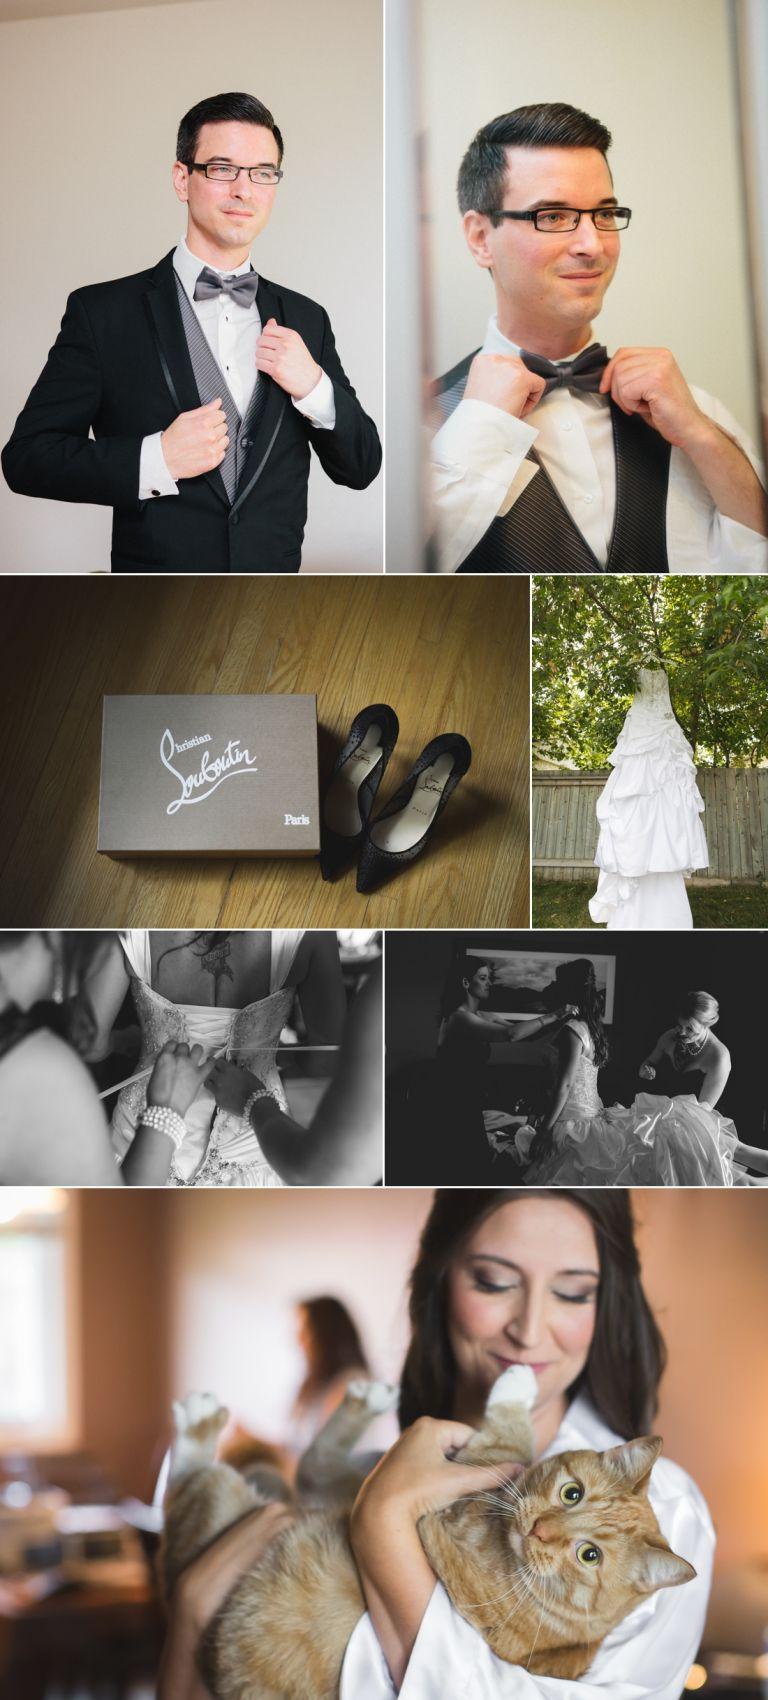 Edmonton-Wedding-Photographers-Stacey-Robert-Sneak-Peek 1